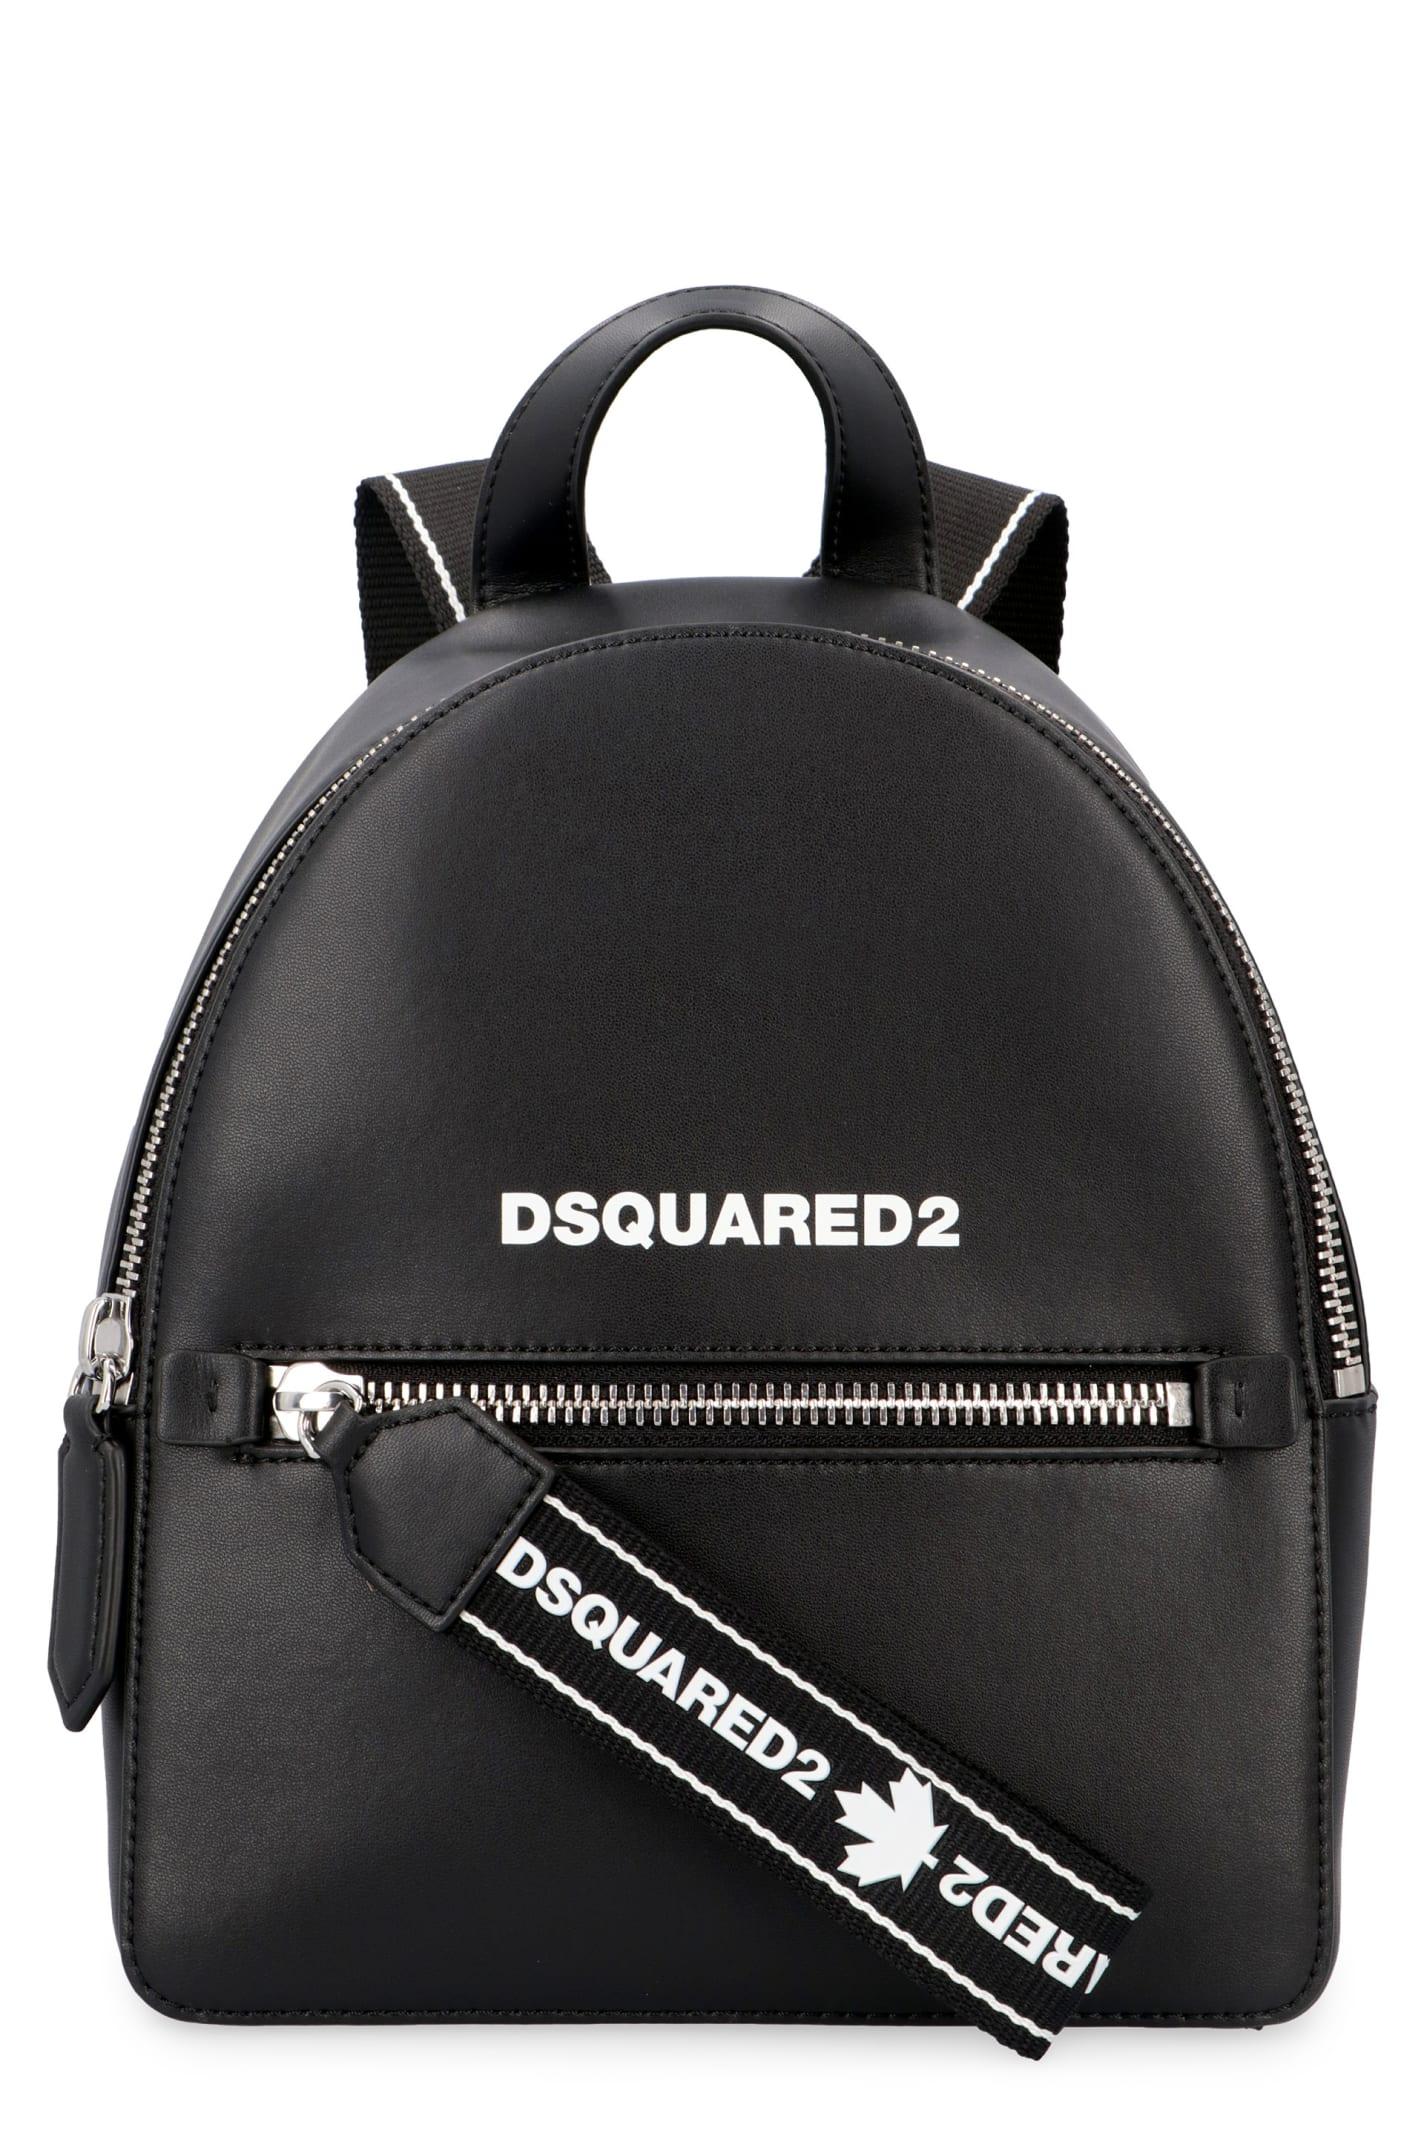 Zip closureFront zip pocketInternal zippered pocketAdjustable shoulder strapsSilver-tone metal hardwareEco-suede liningWidth: 21 cmHeight: 26 cmDepth: 13 cm100% Calf